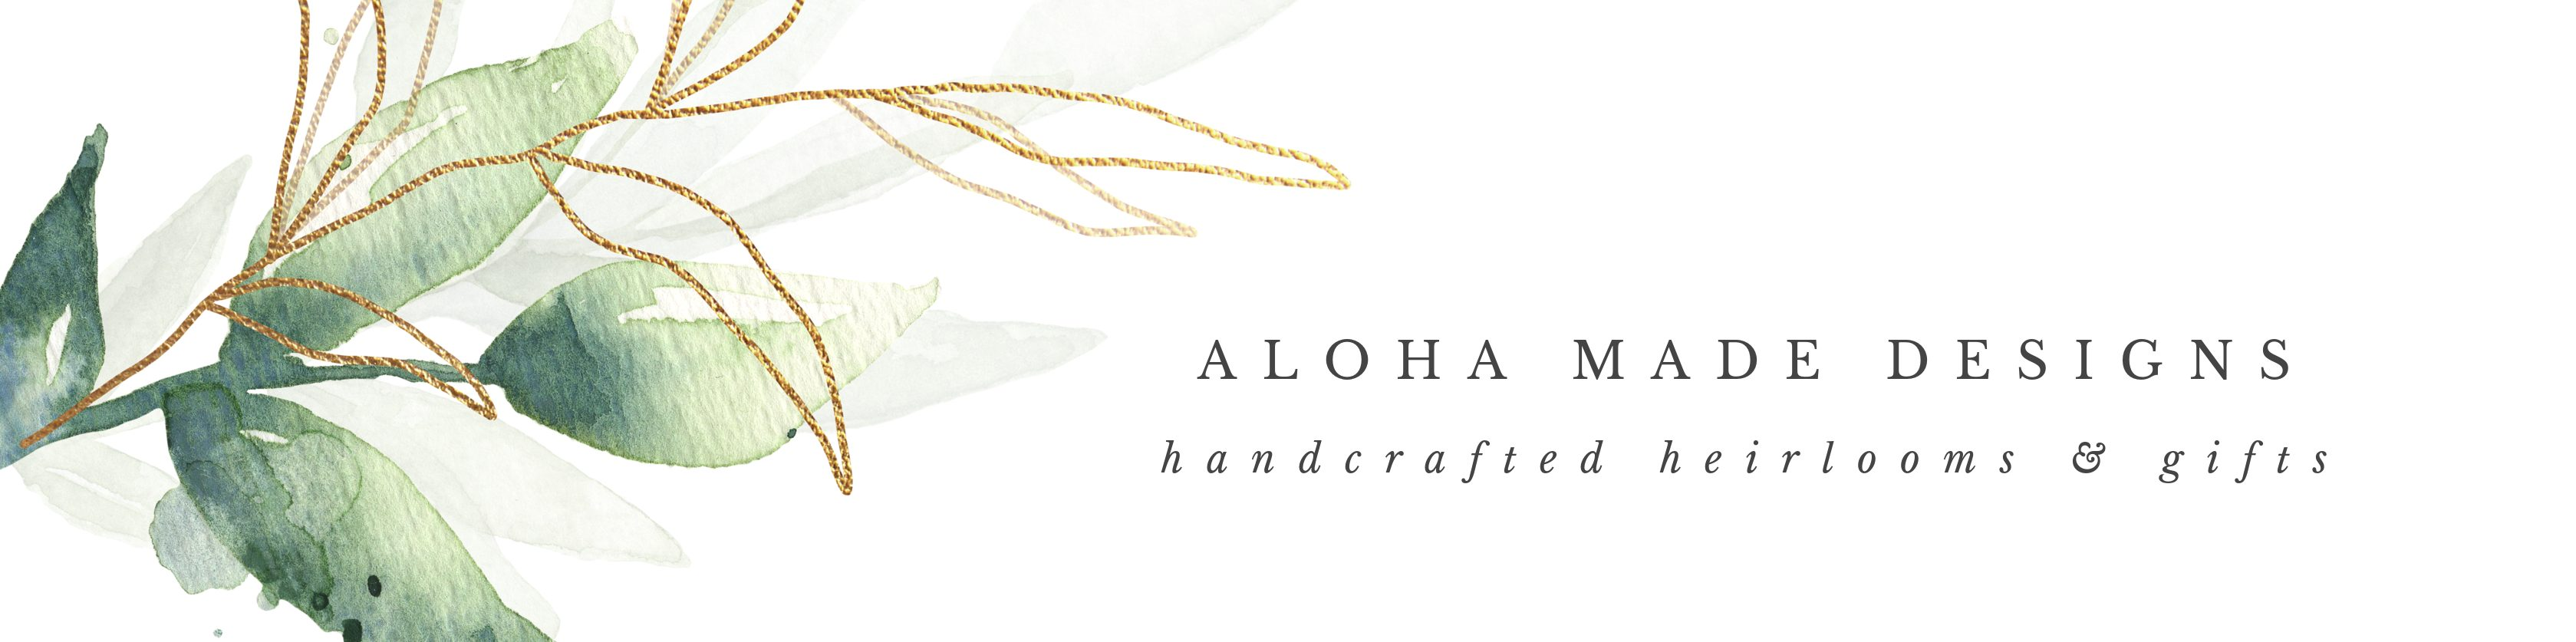 Aloha Made Designs